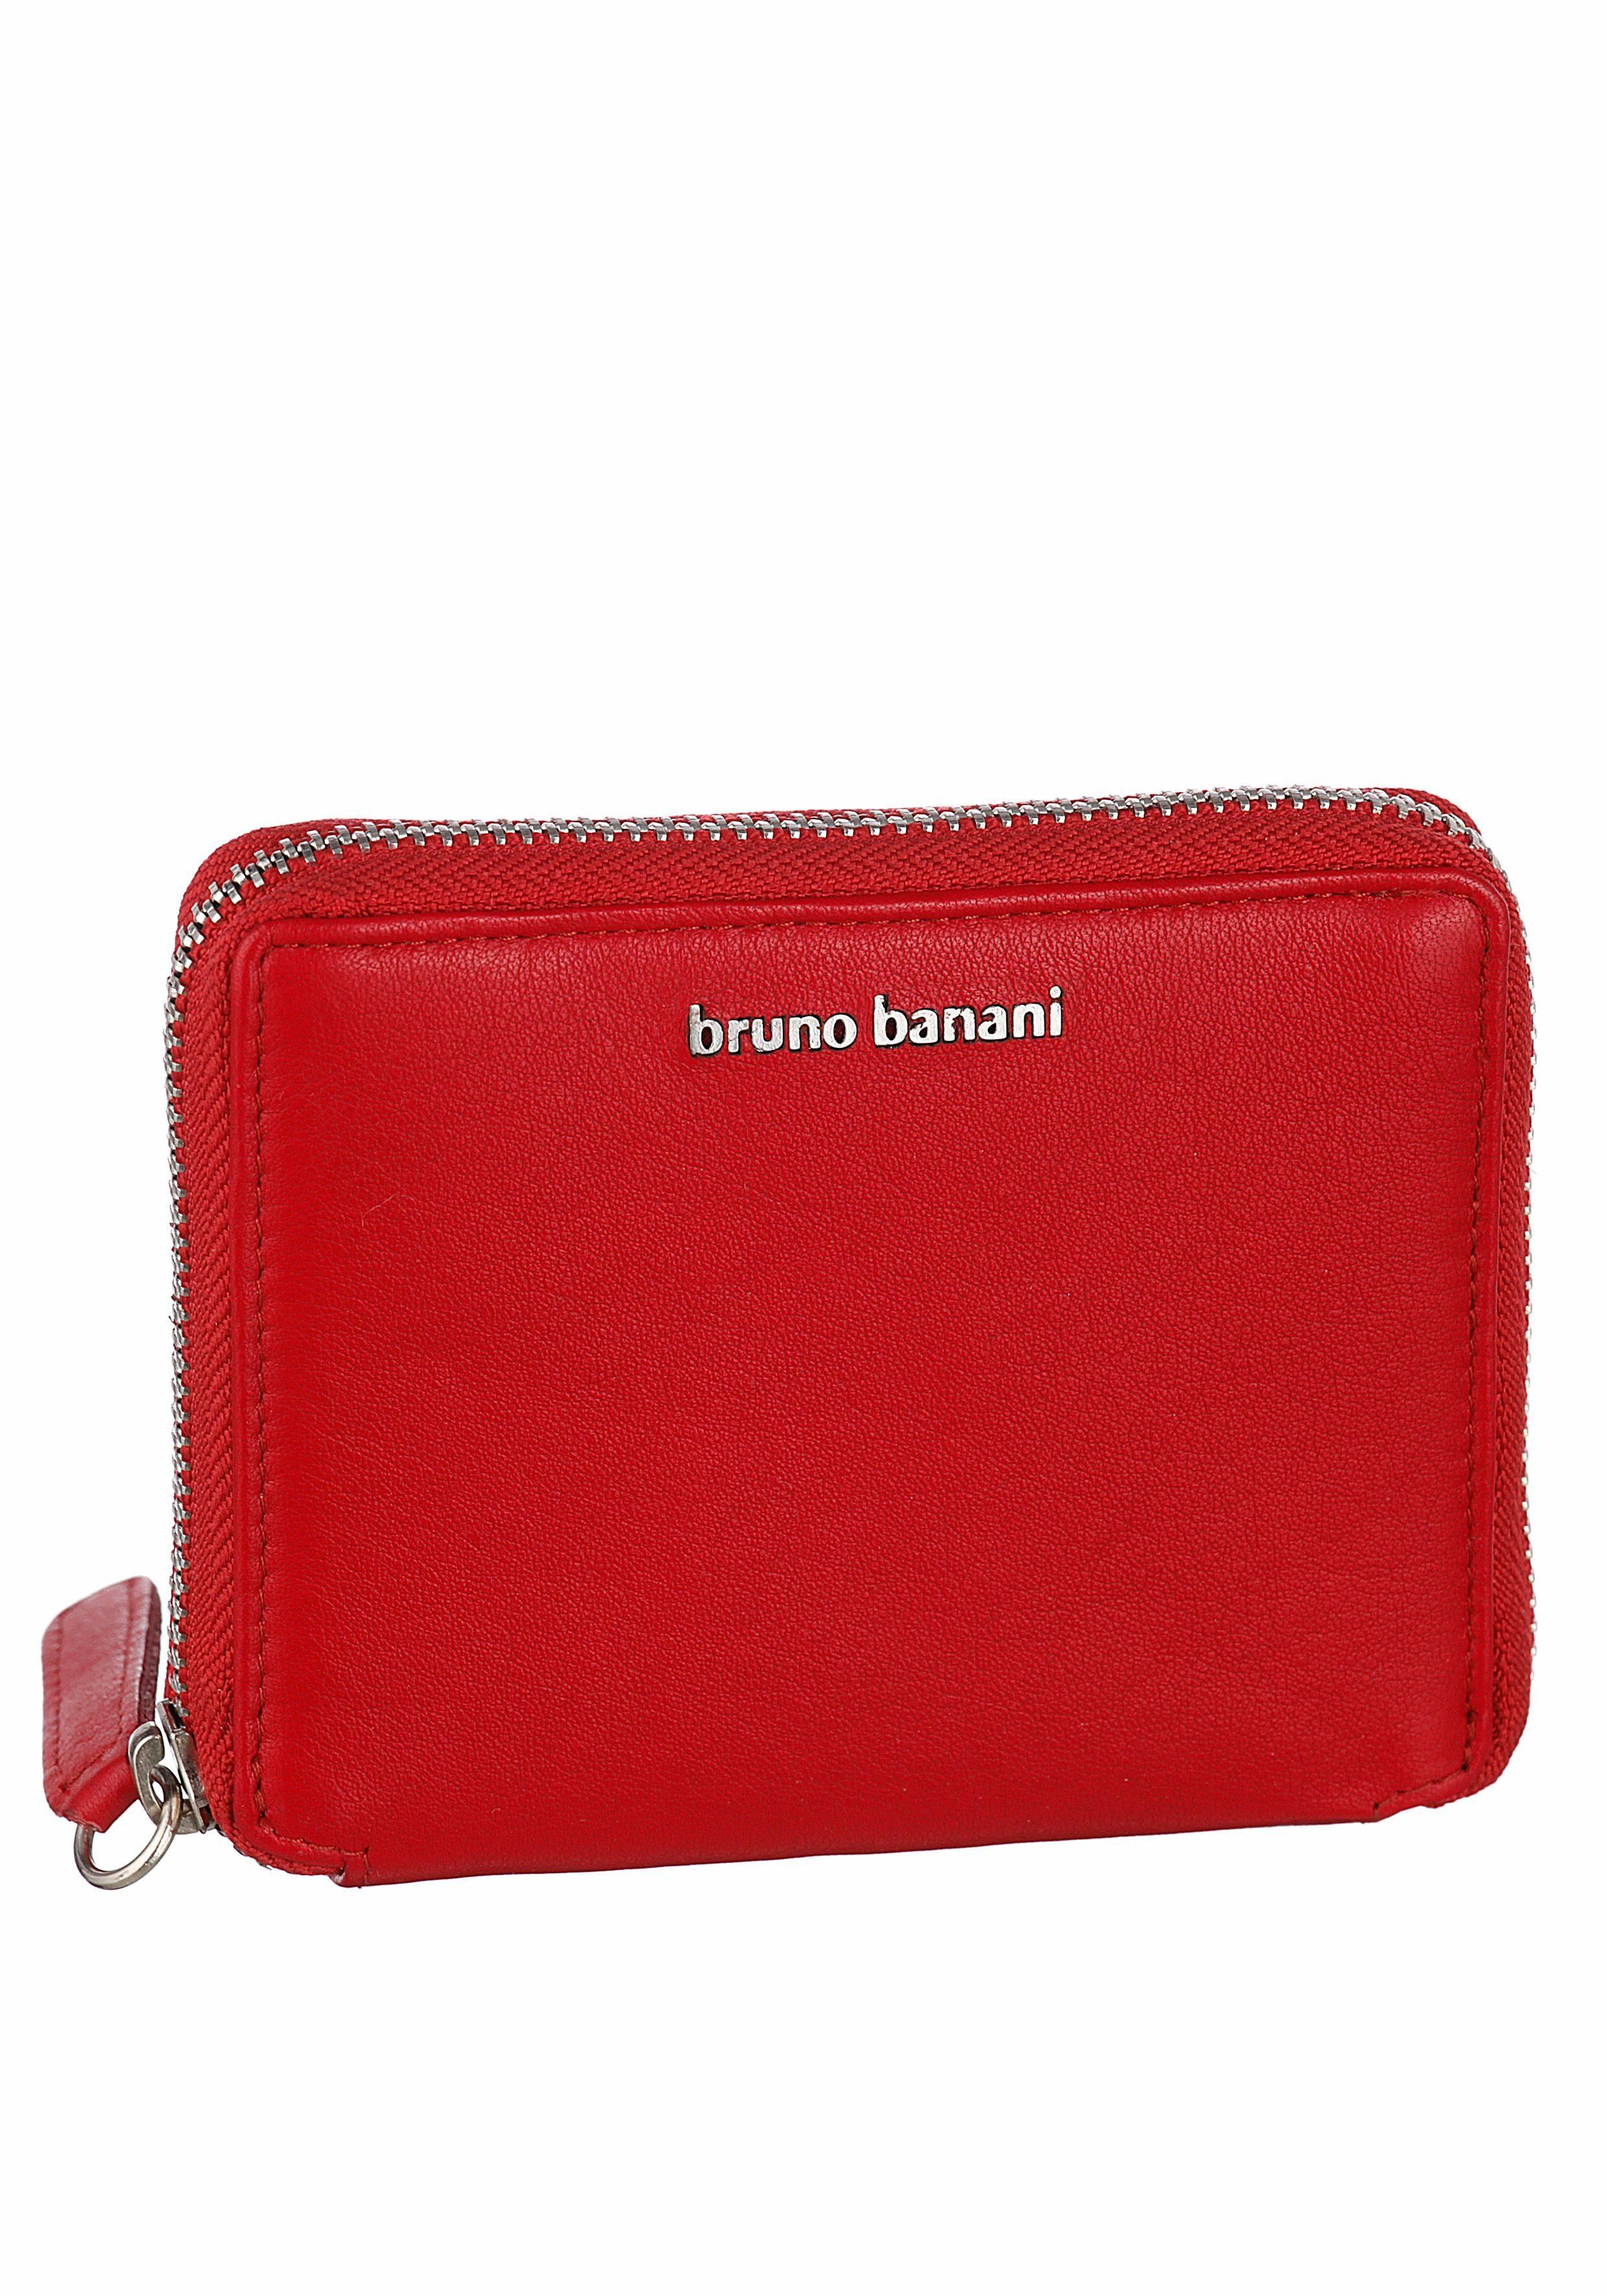 2a101e1b7dd Bruno banani dames portemonnee rood leder Rode portemonnee dames bruno  banani leder ...